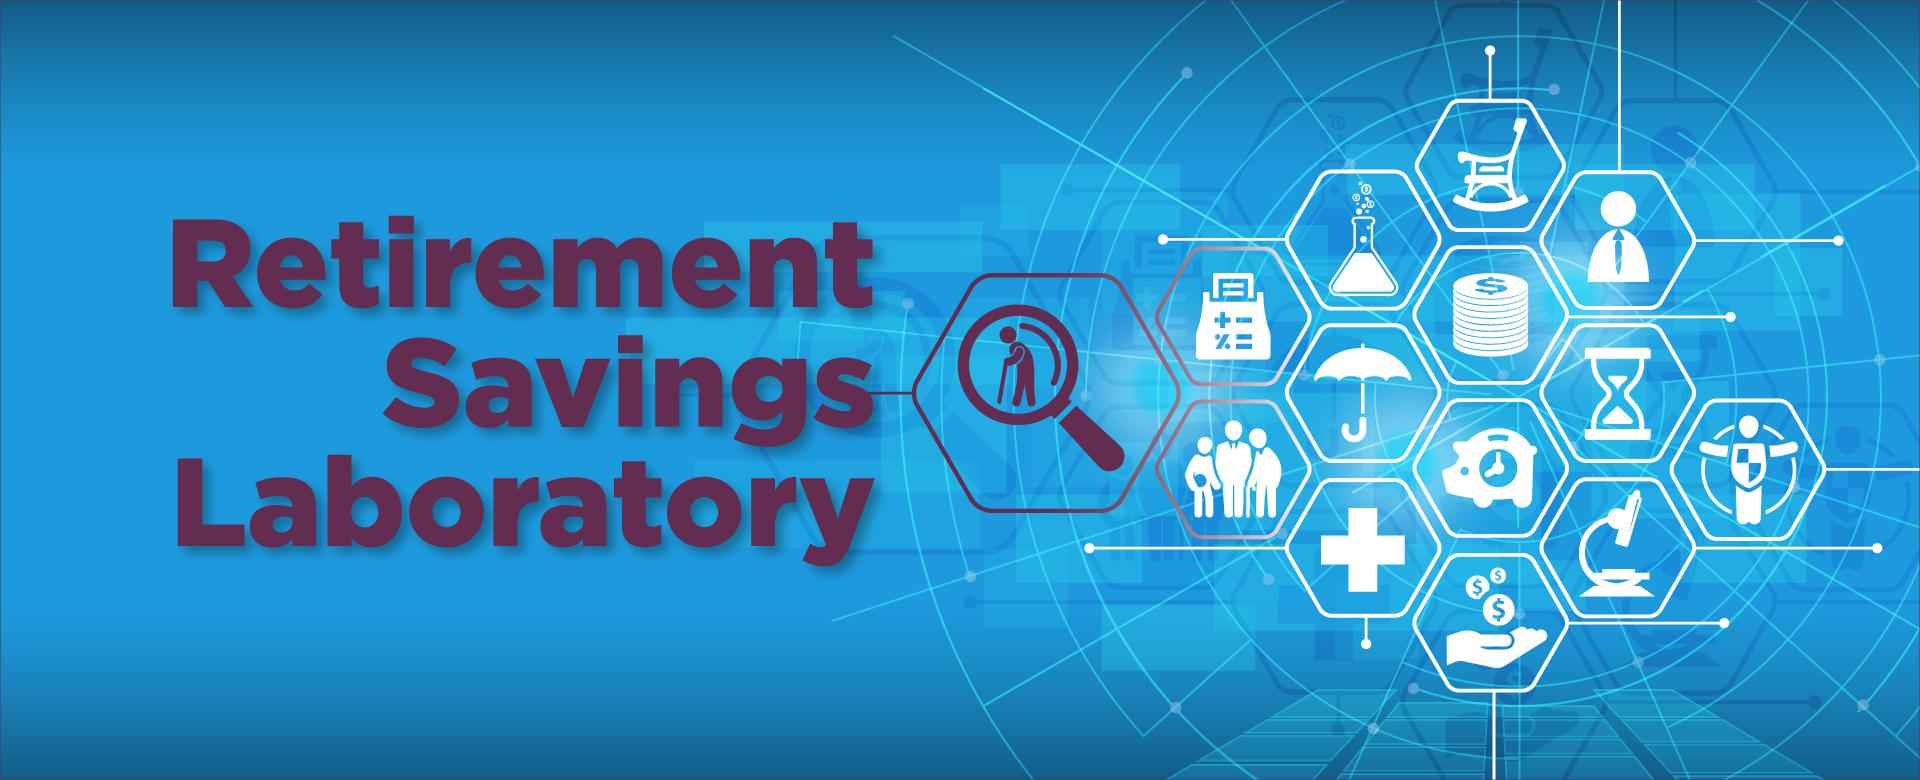 Retirement Savings Laboratory